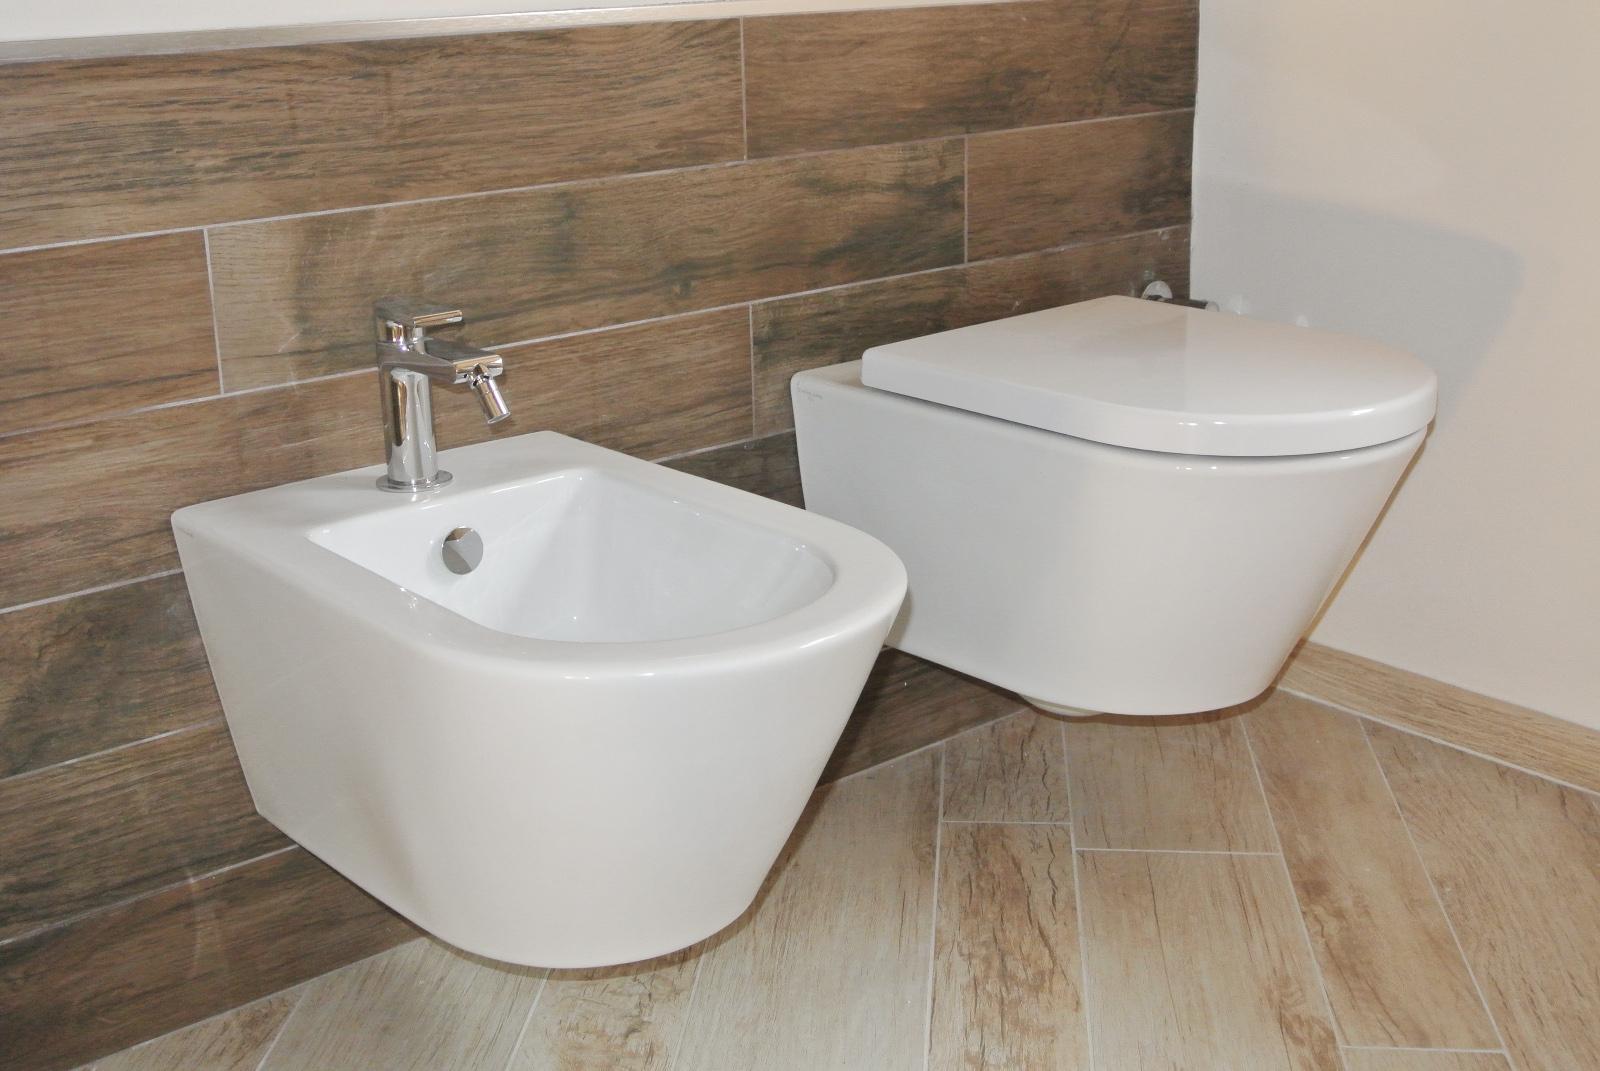 sintesibagno-verbania-sanitari-catalanoarredobagno-lavabo-corian-miscelatore-lavabo-prolungato-bpnomi-bonny-catalano-zero-55-vaso-bidet